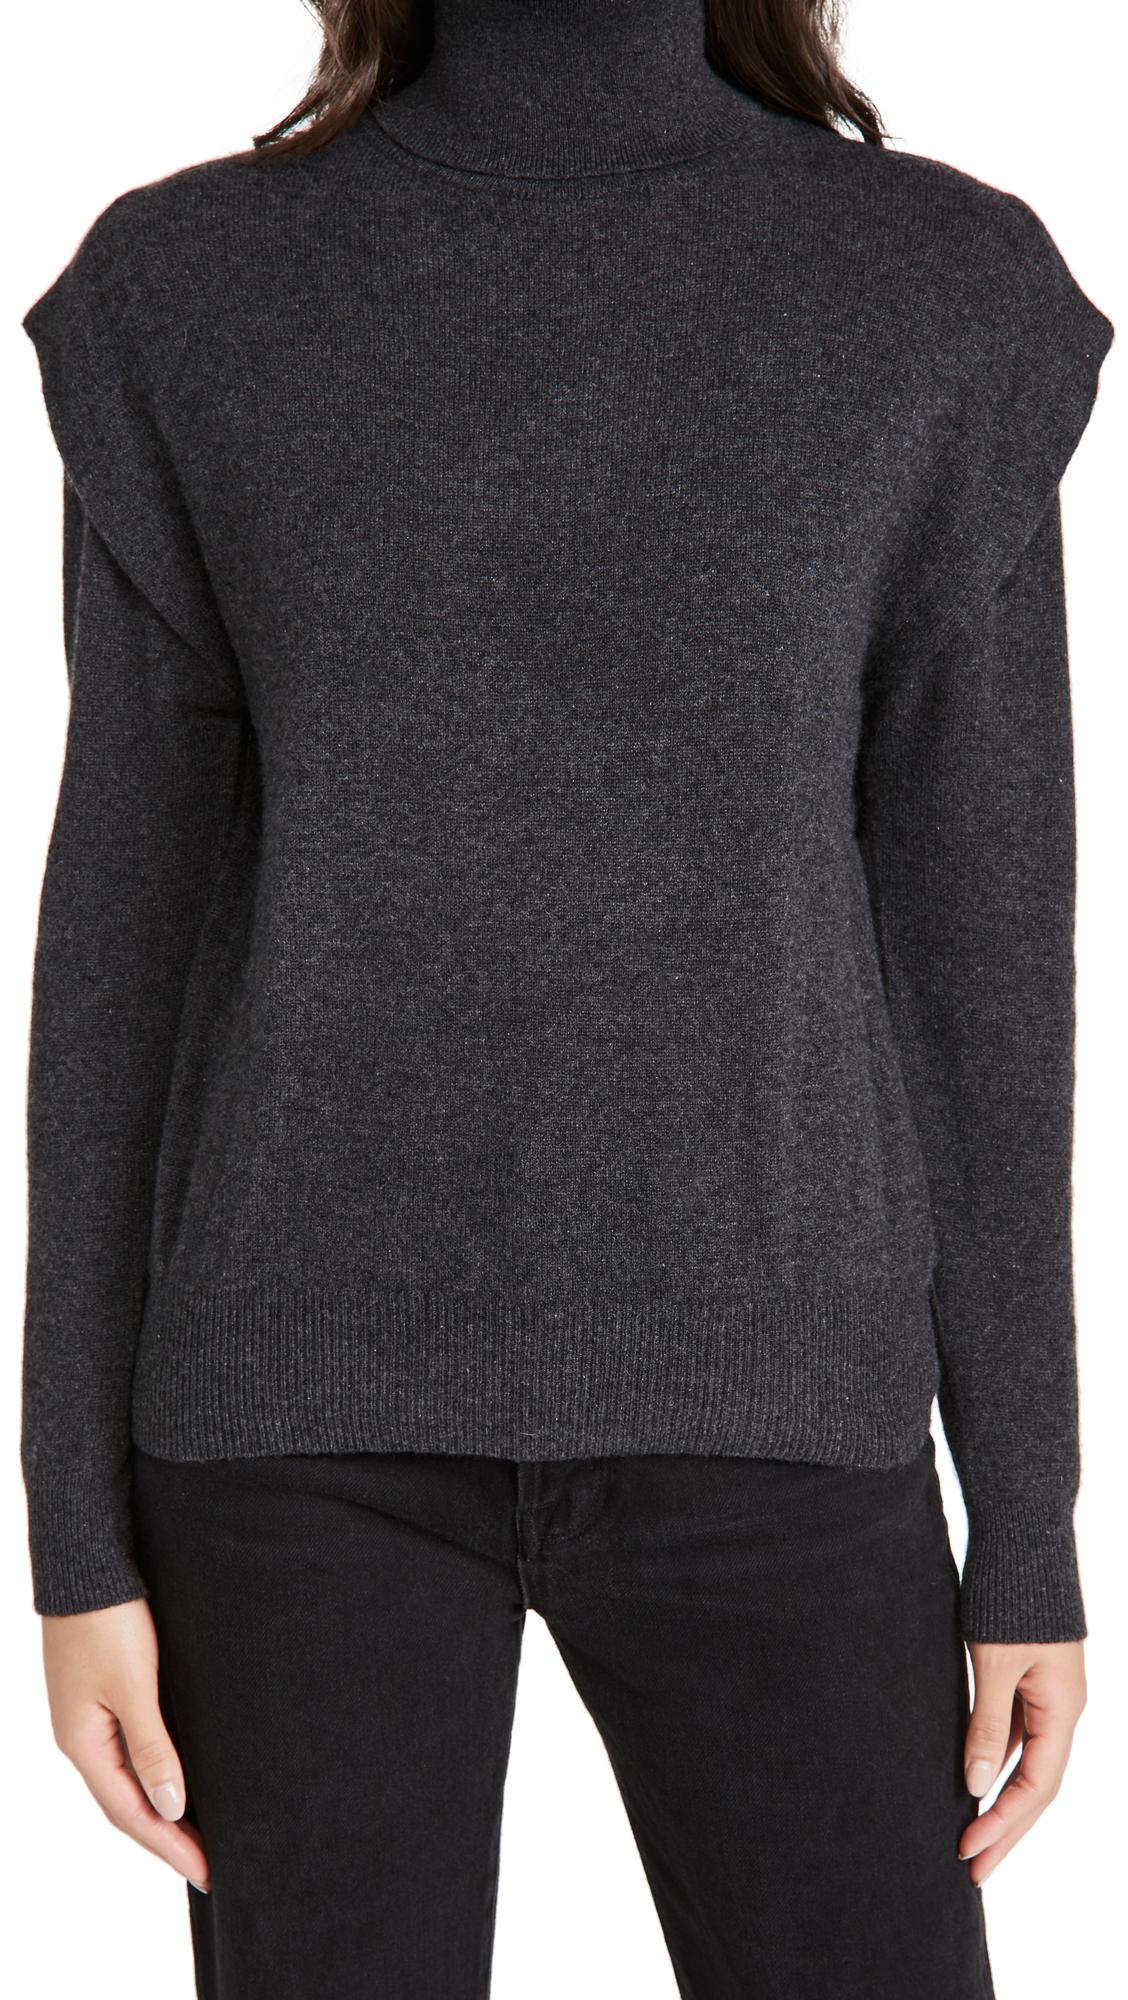 Autumn Cashmere Flange Shoulder Cashmere Turtleneck